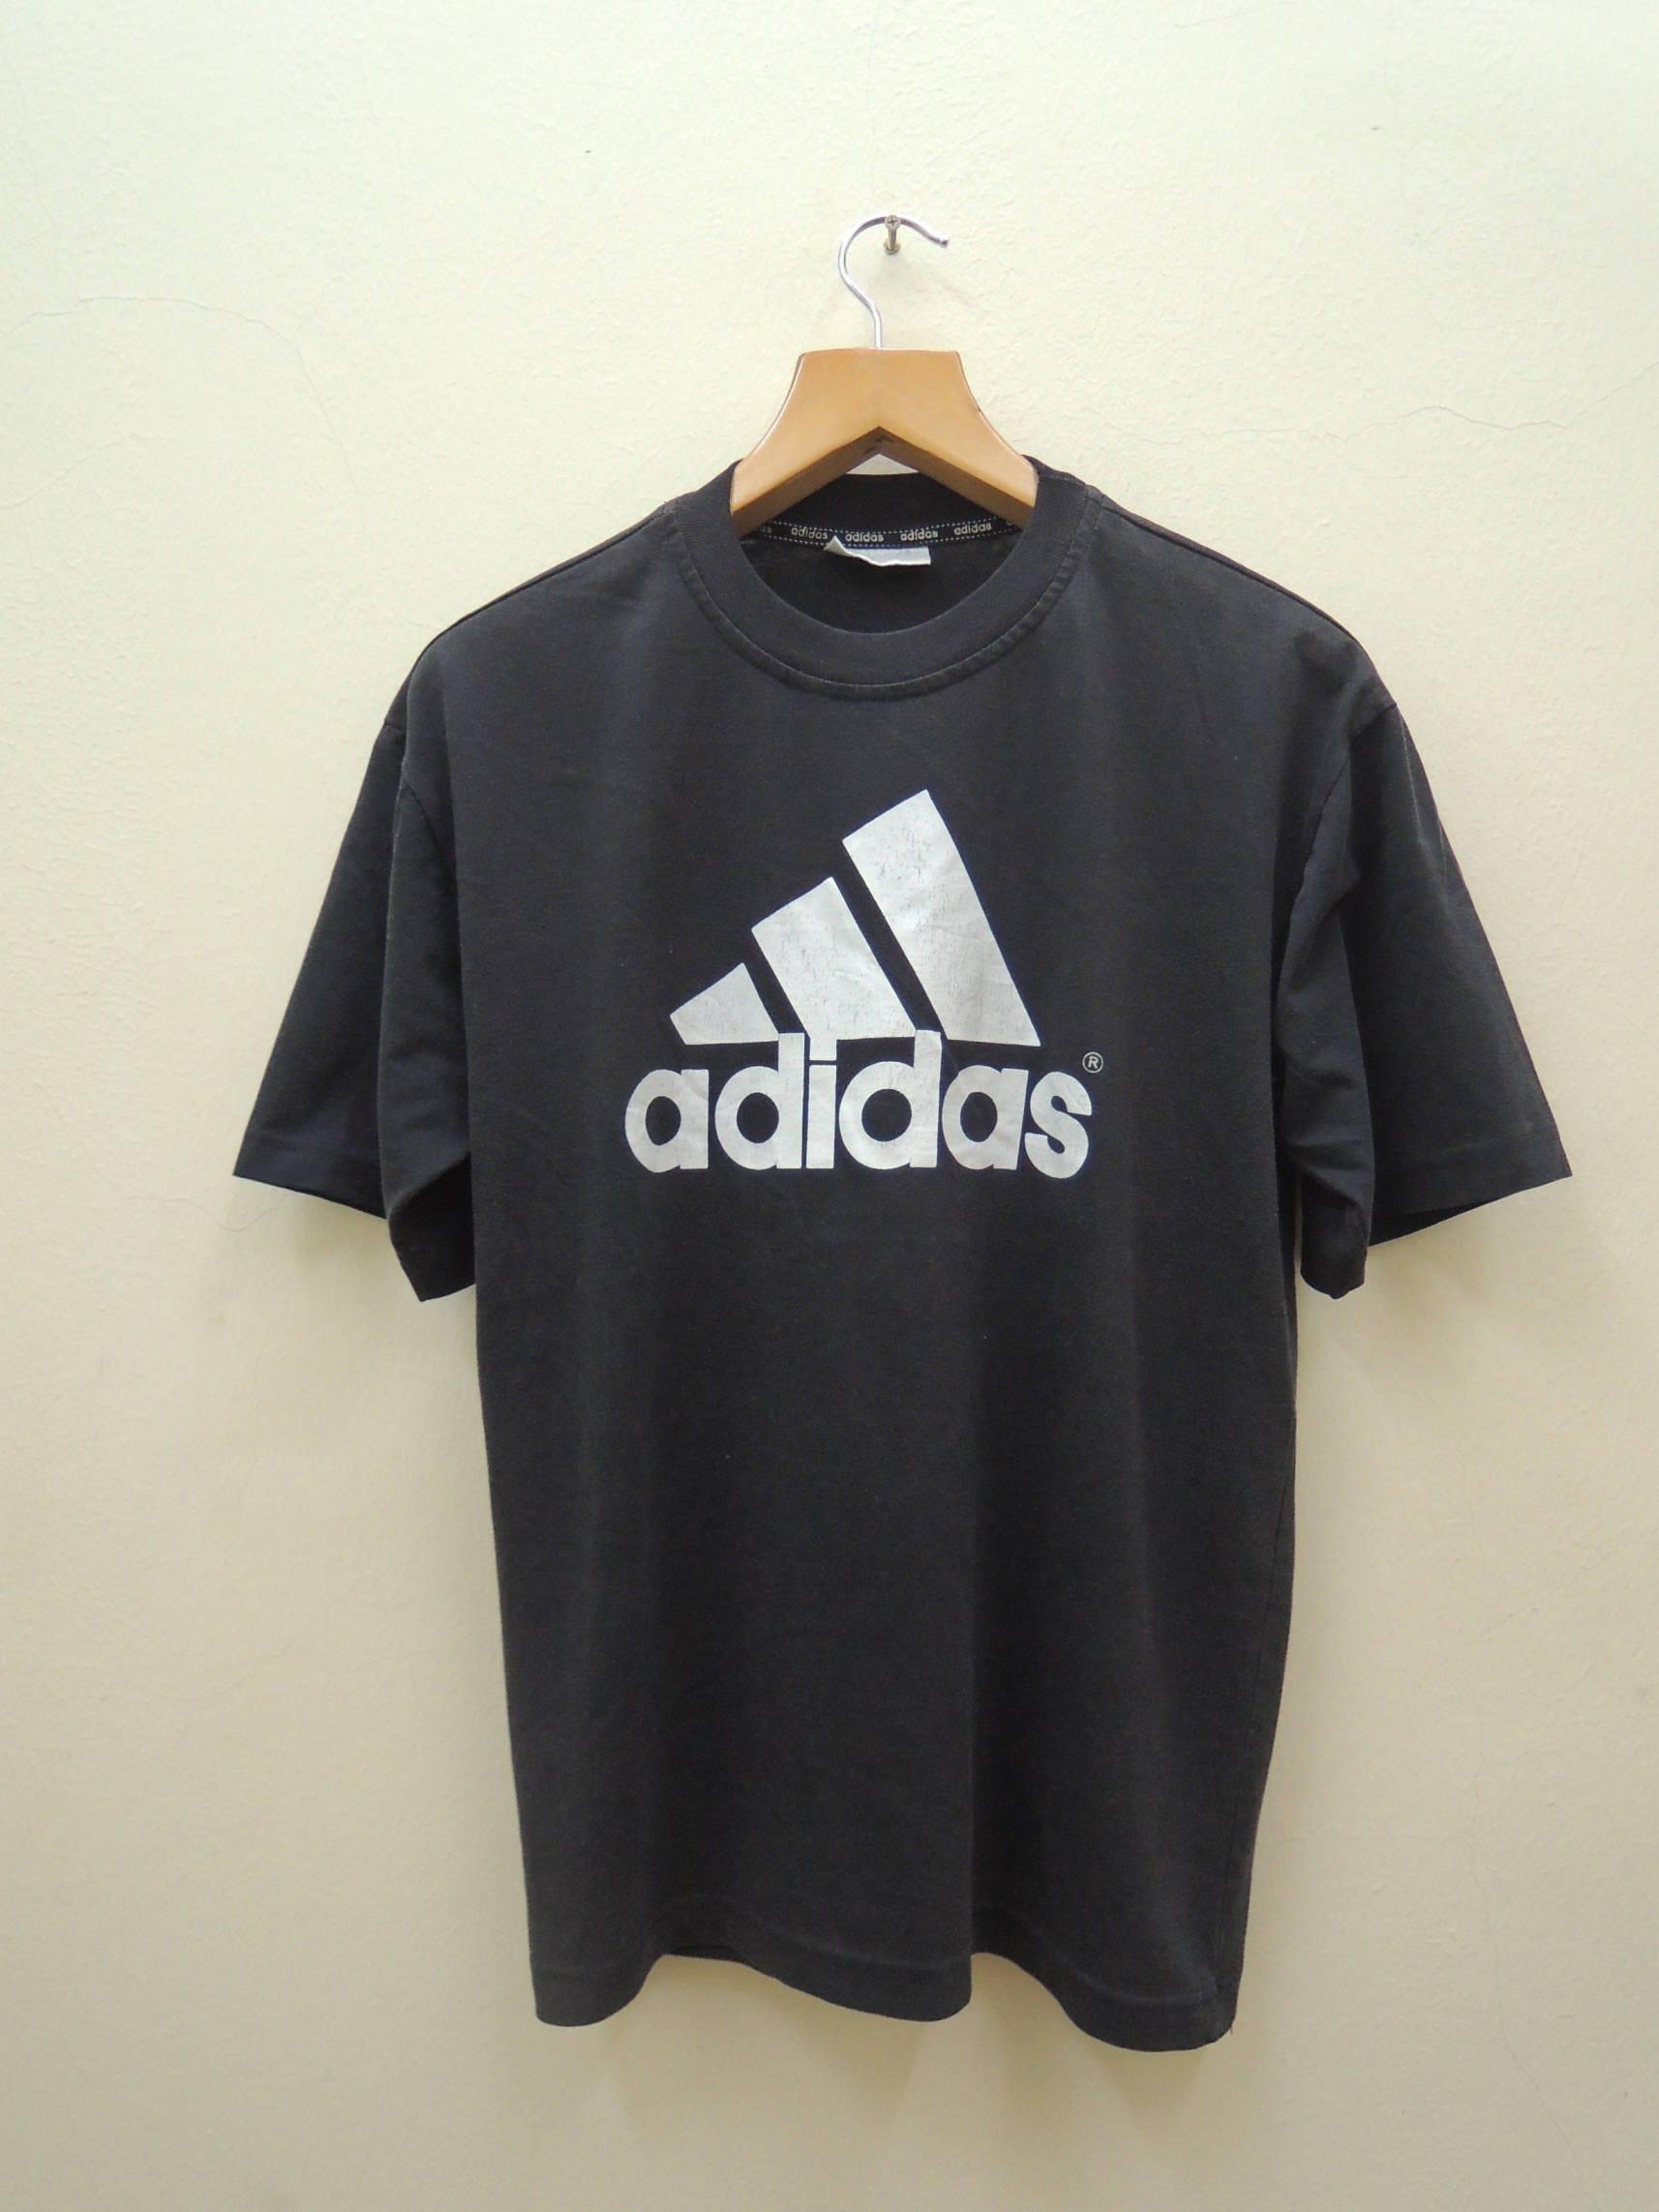 vintage adidas logo t shirt